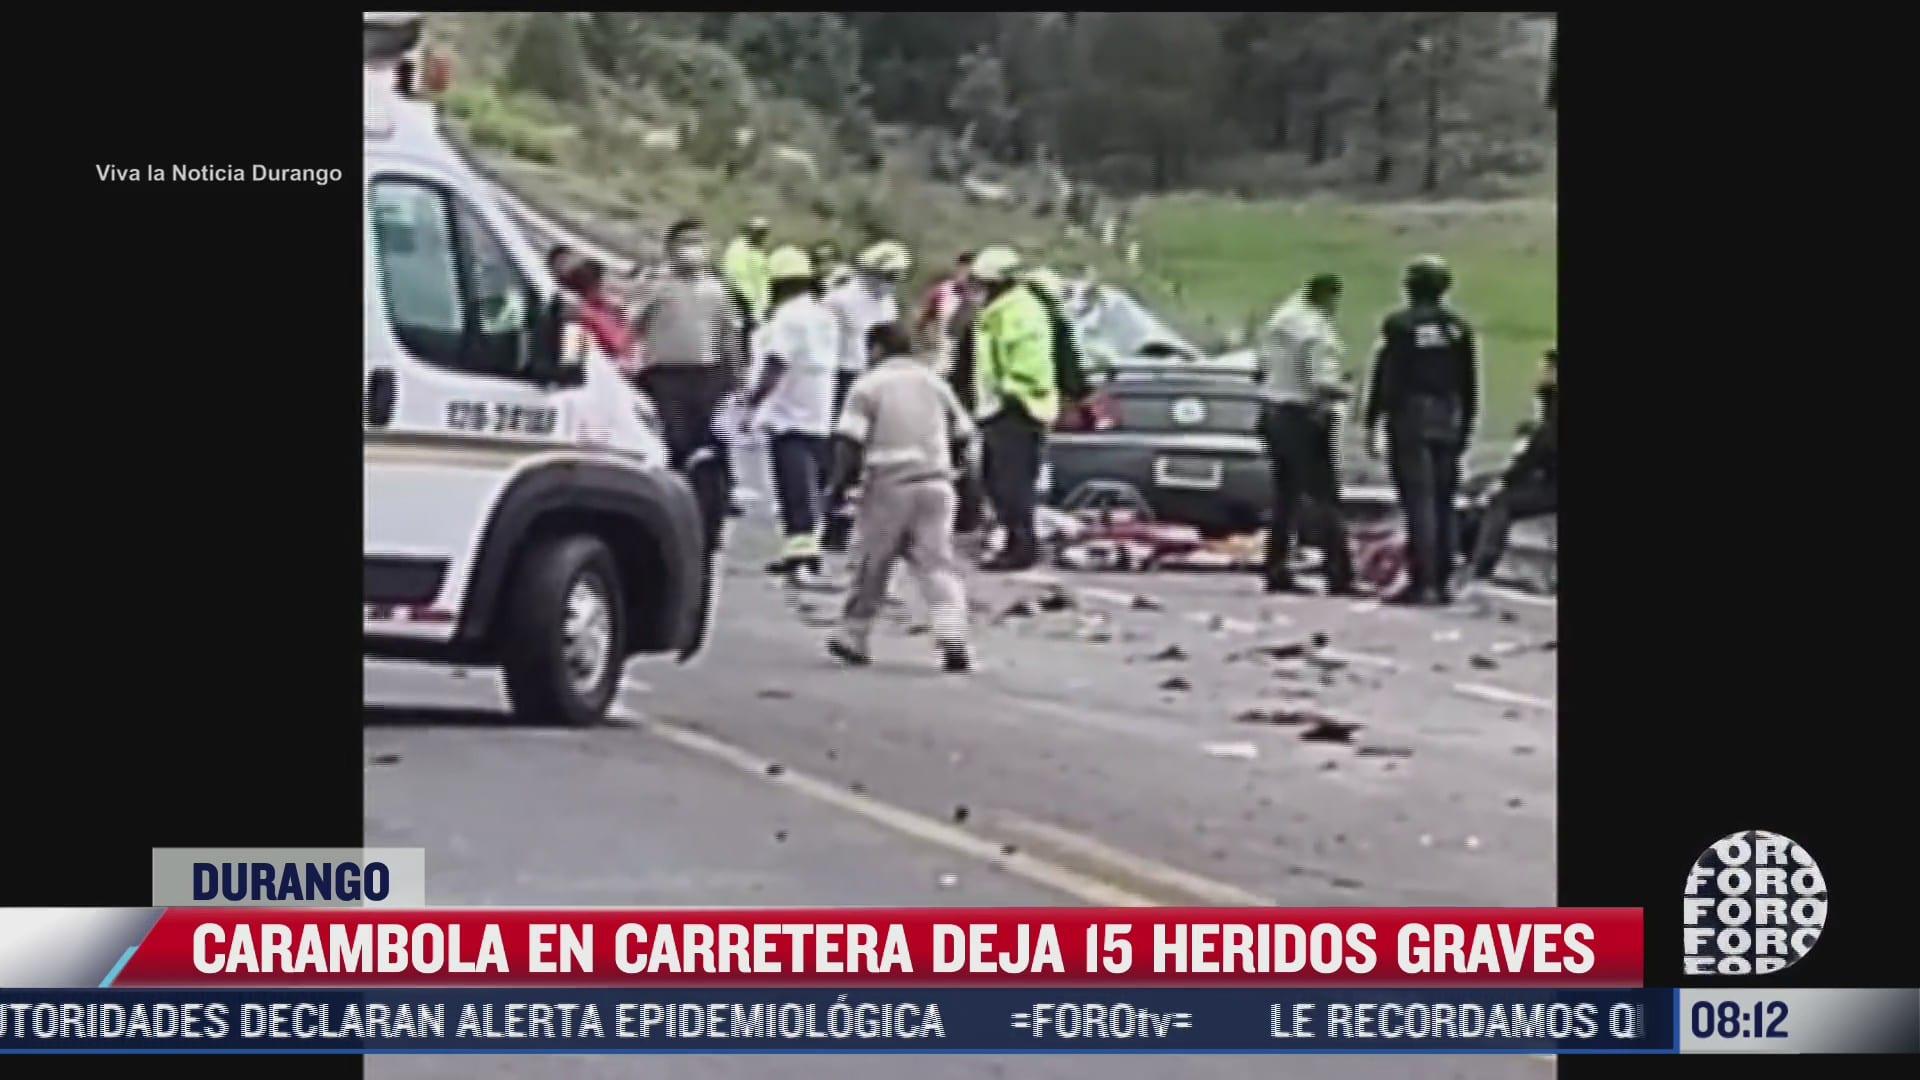 choque multiple en la super carretera mazatlan durango deja 15 lesionados